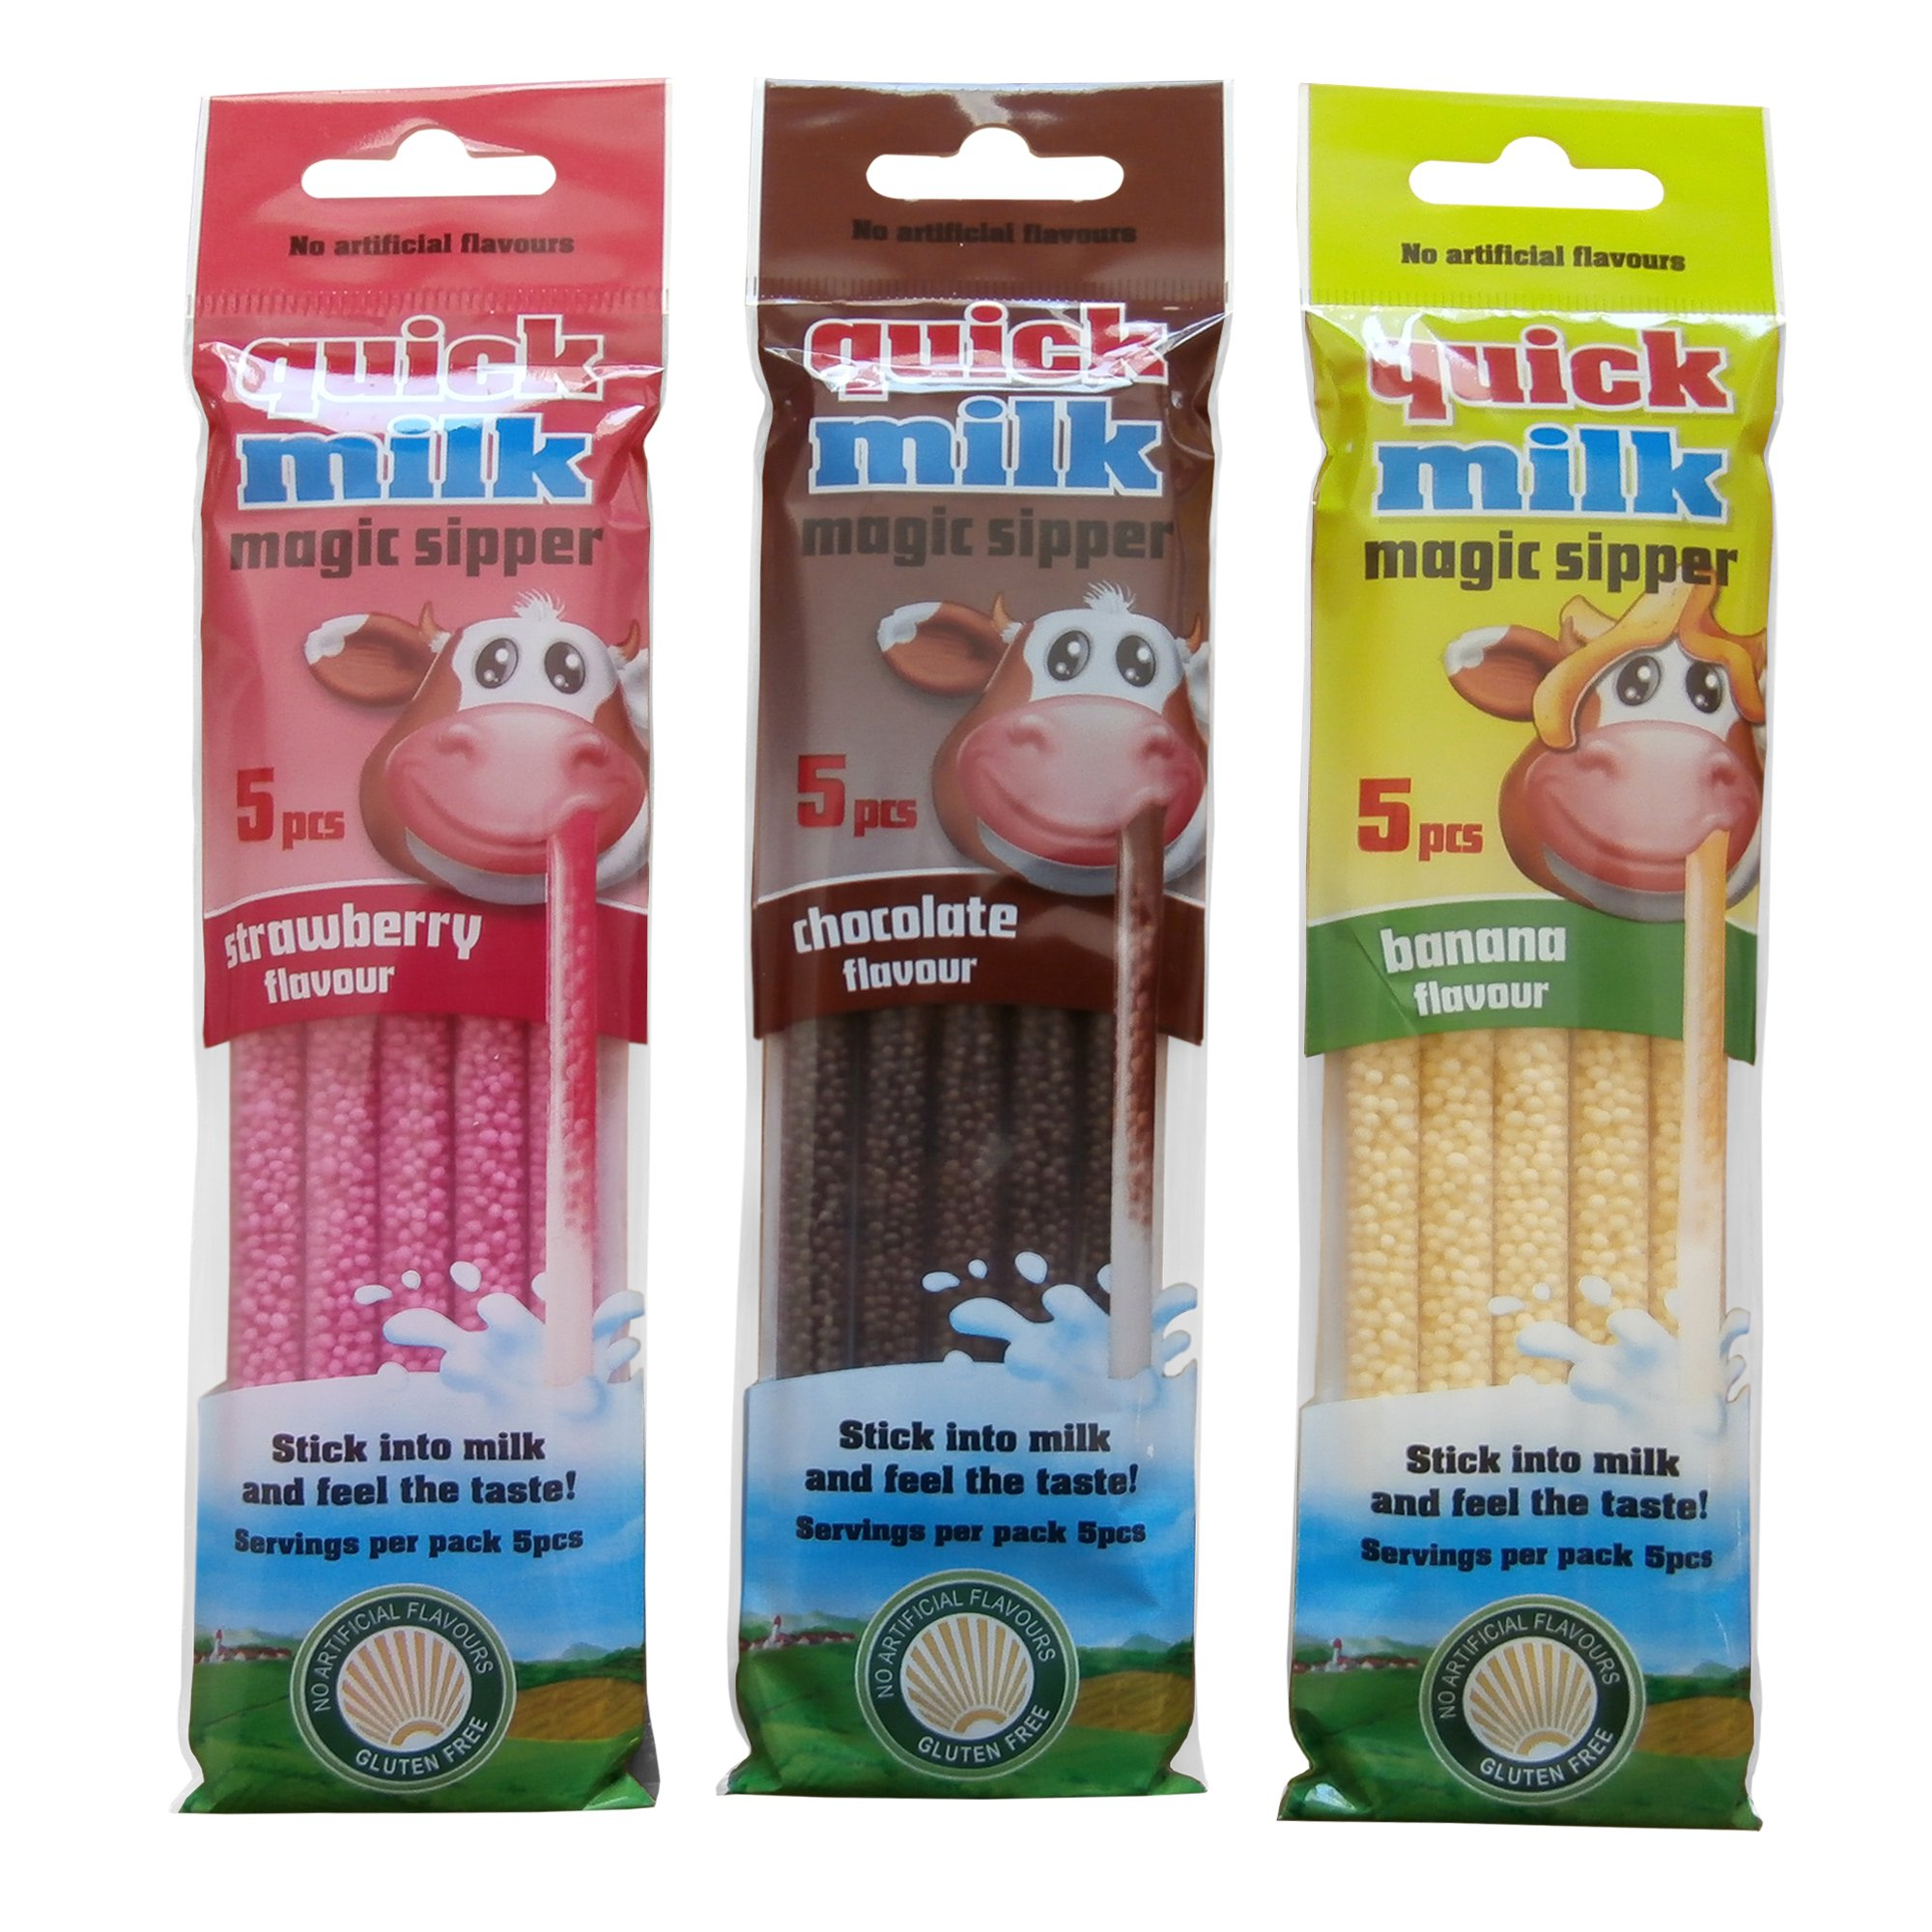 Quick-Milk Magic Sipper Straws, Flavoured Straws for instant Milkshake - Strawberry - Chocolate - Banana